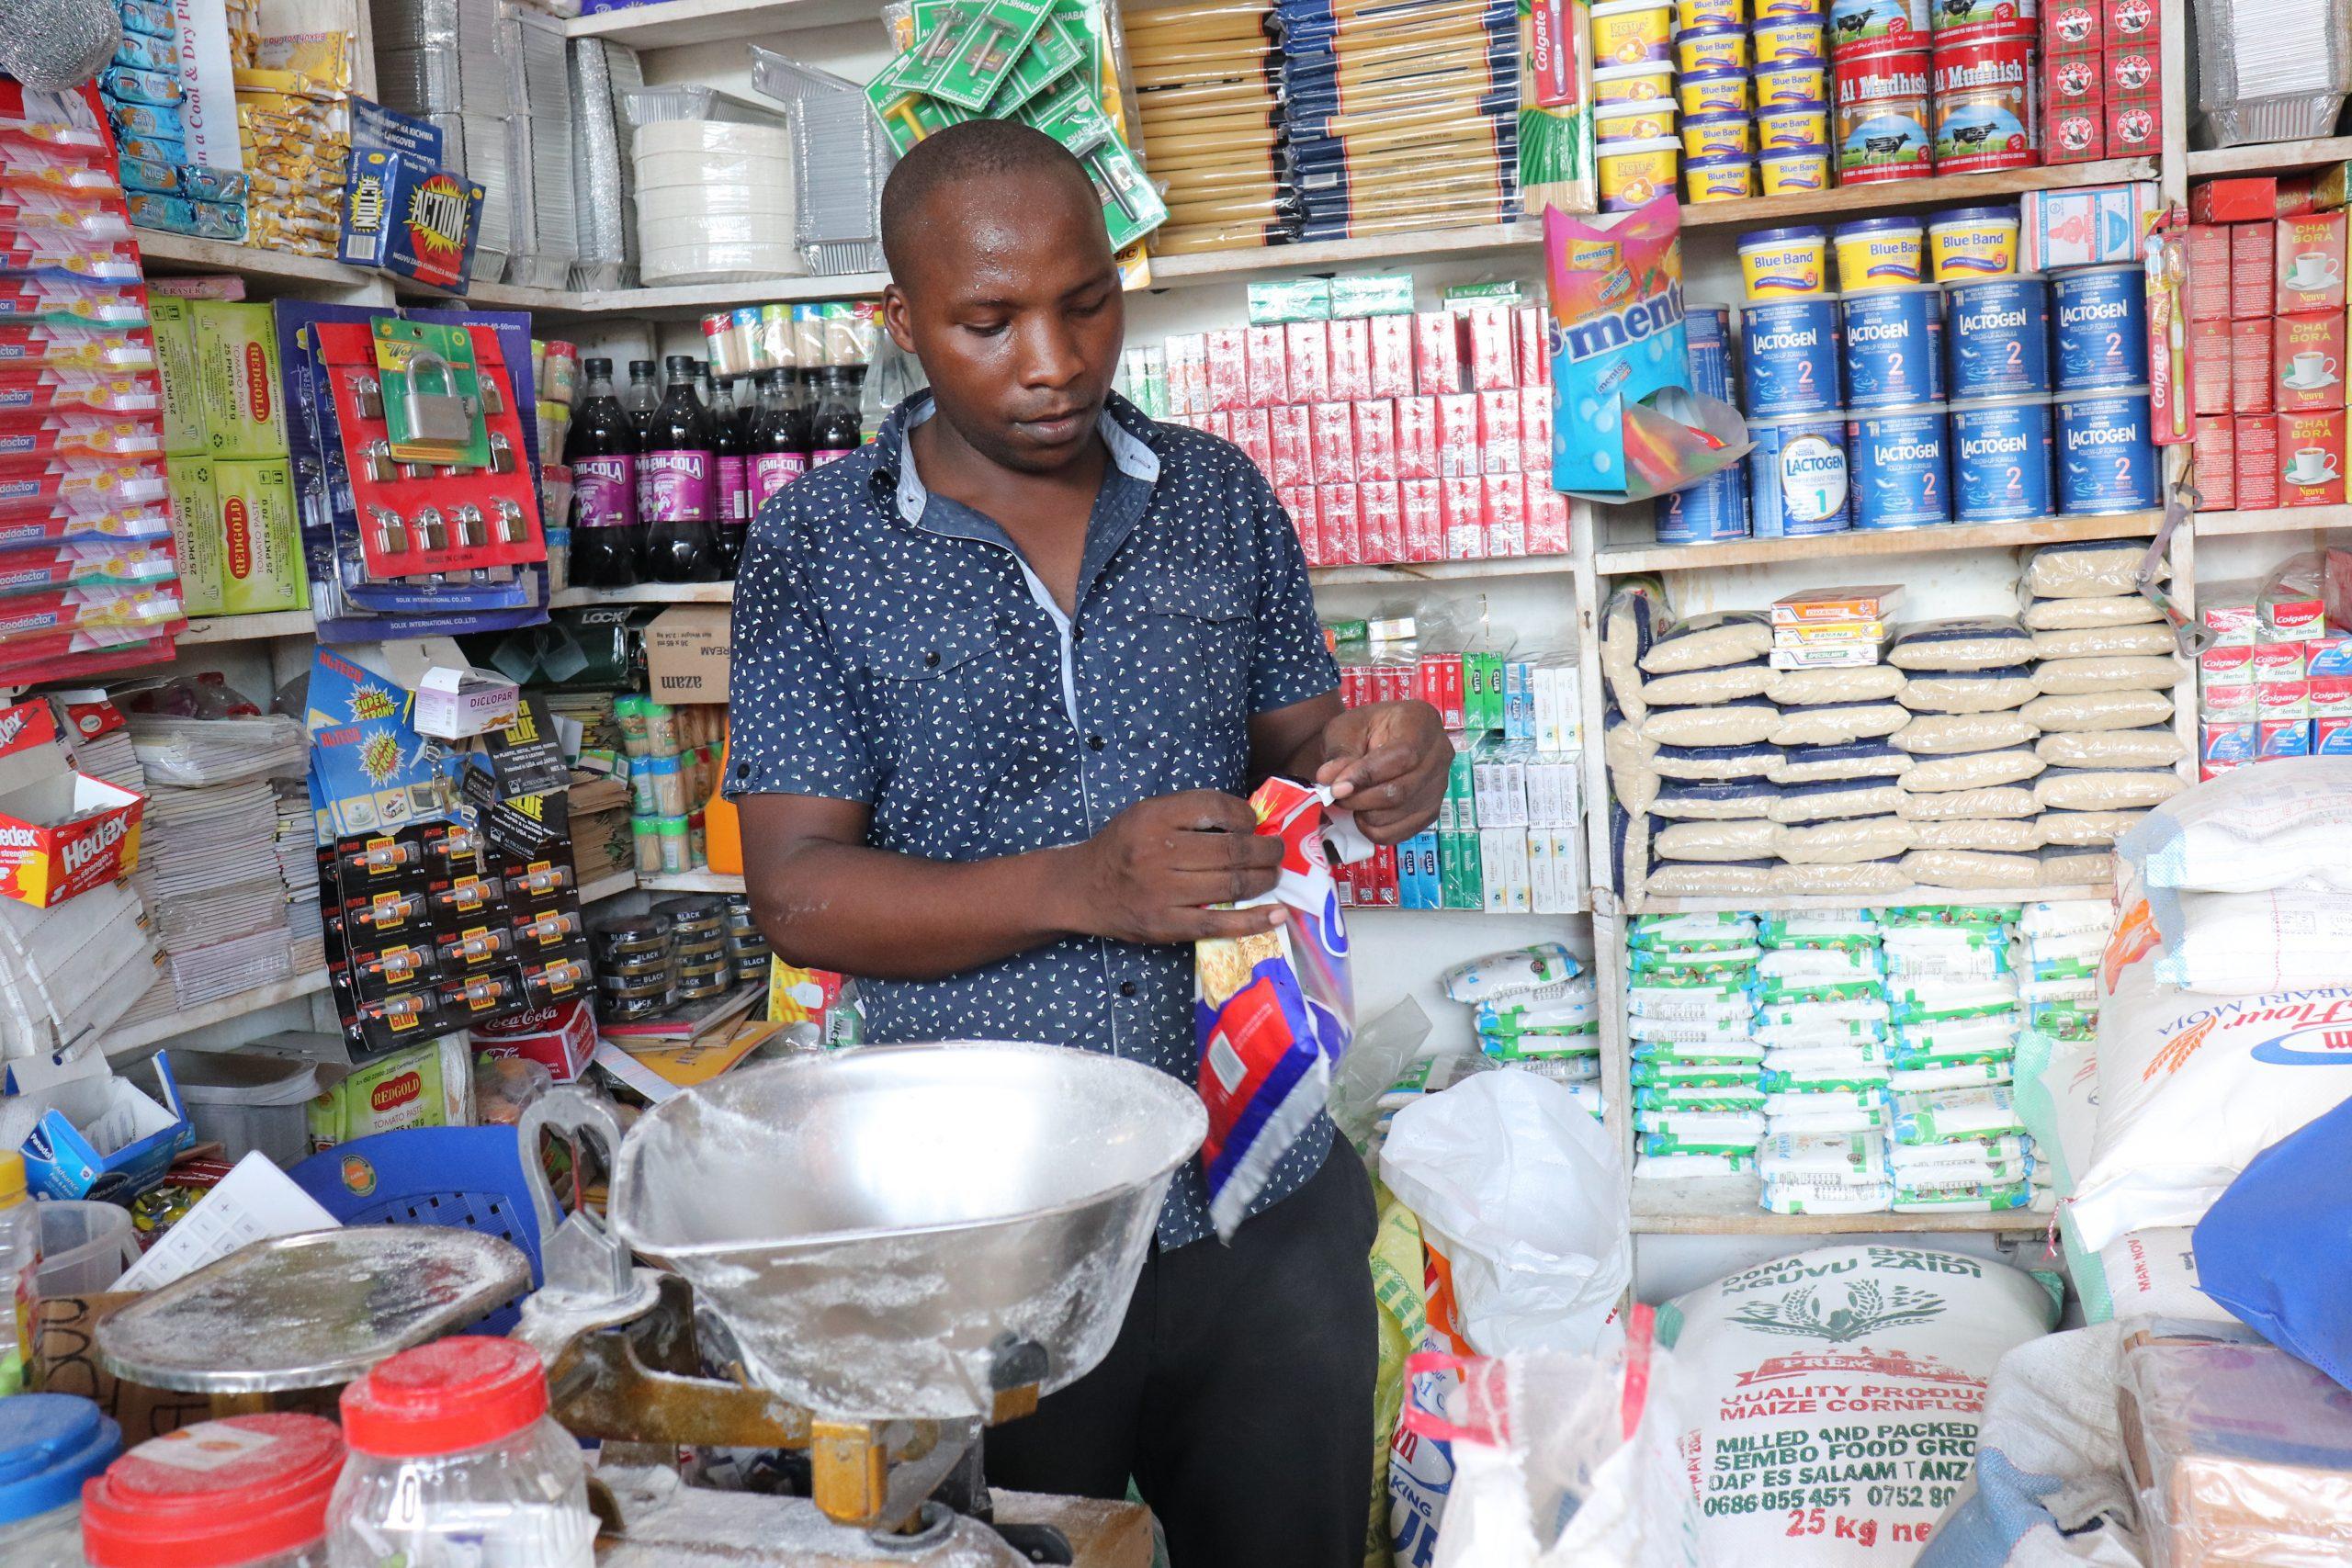 Emanuel Barosha Ndiwene organizes products in his small shop in Dar es Salaam, Tanzania